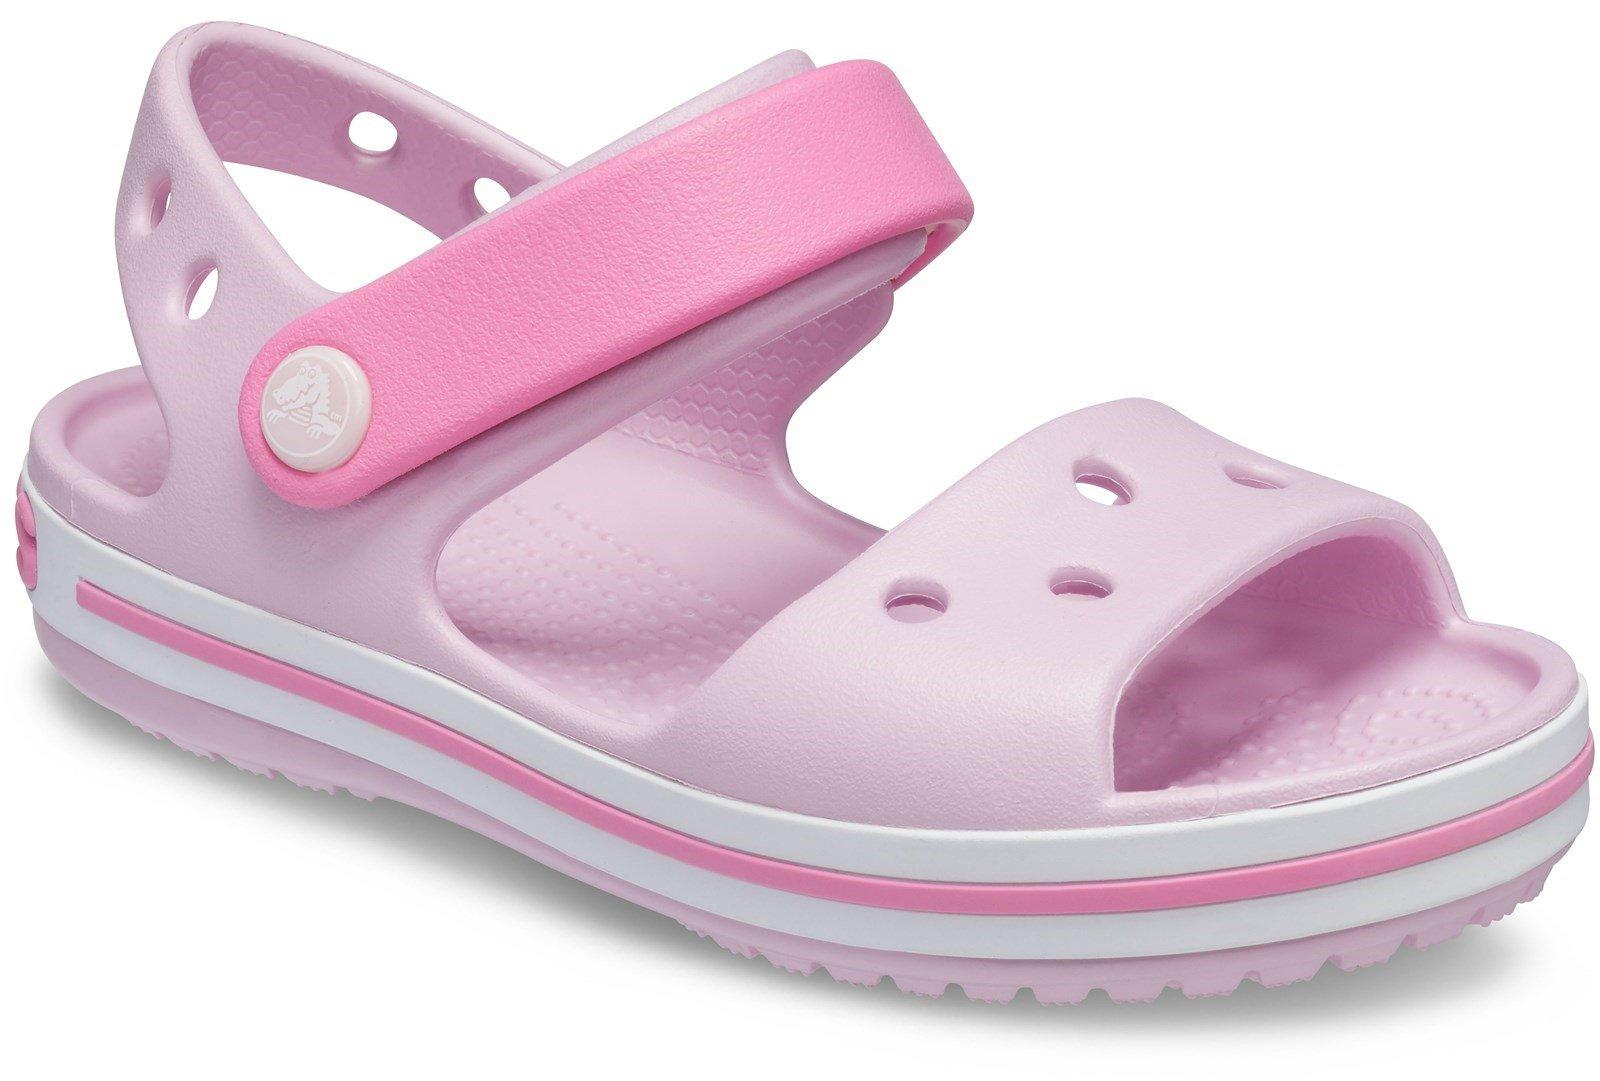 Crocs Kid's Crocband Sandal Various Colours 21077 - Ballerina Pink 4